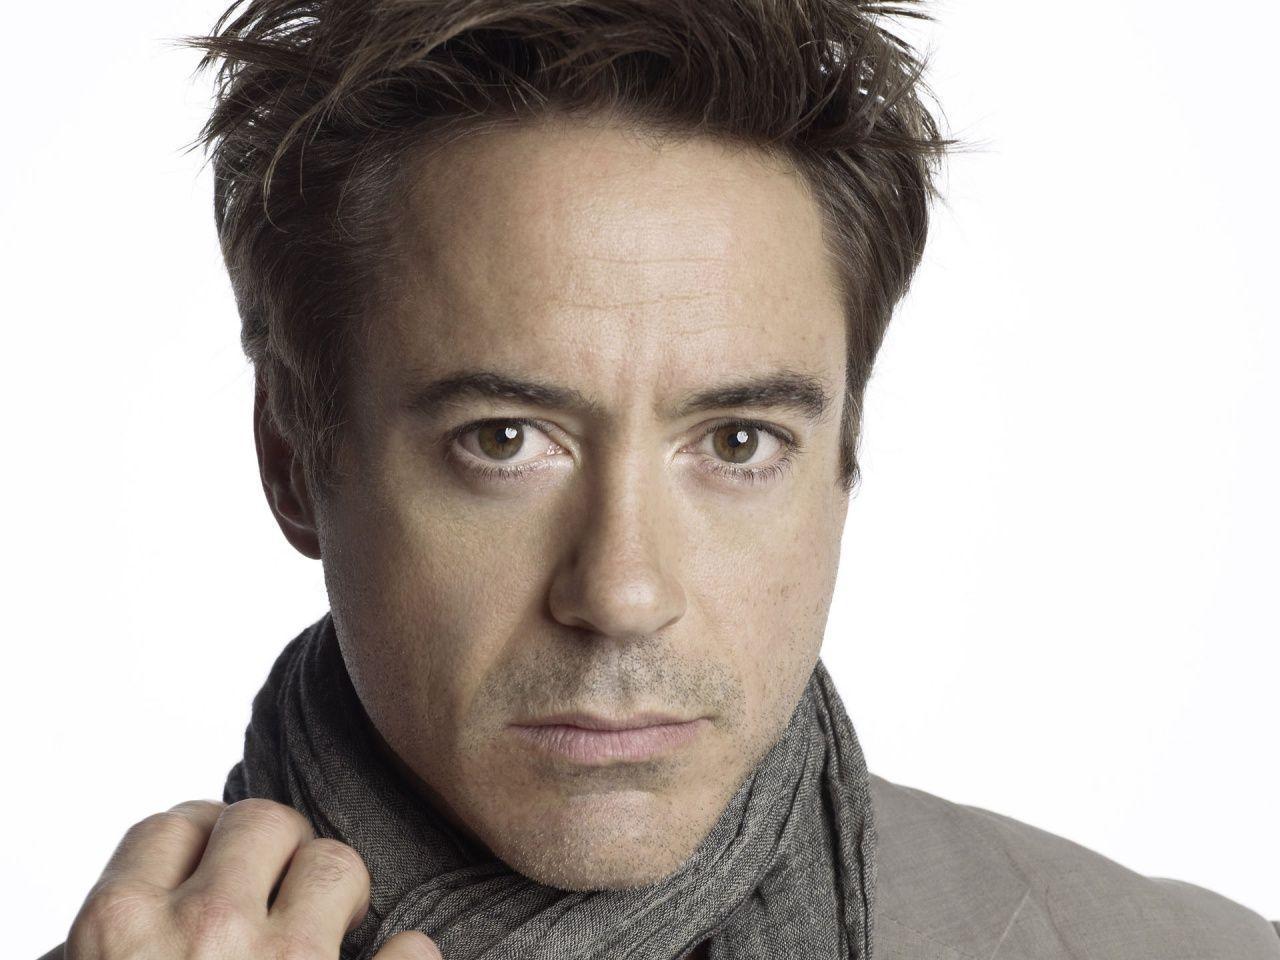 Robert Downey, Jr. Cool Wallpapers 2863 Images | wallgraf.